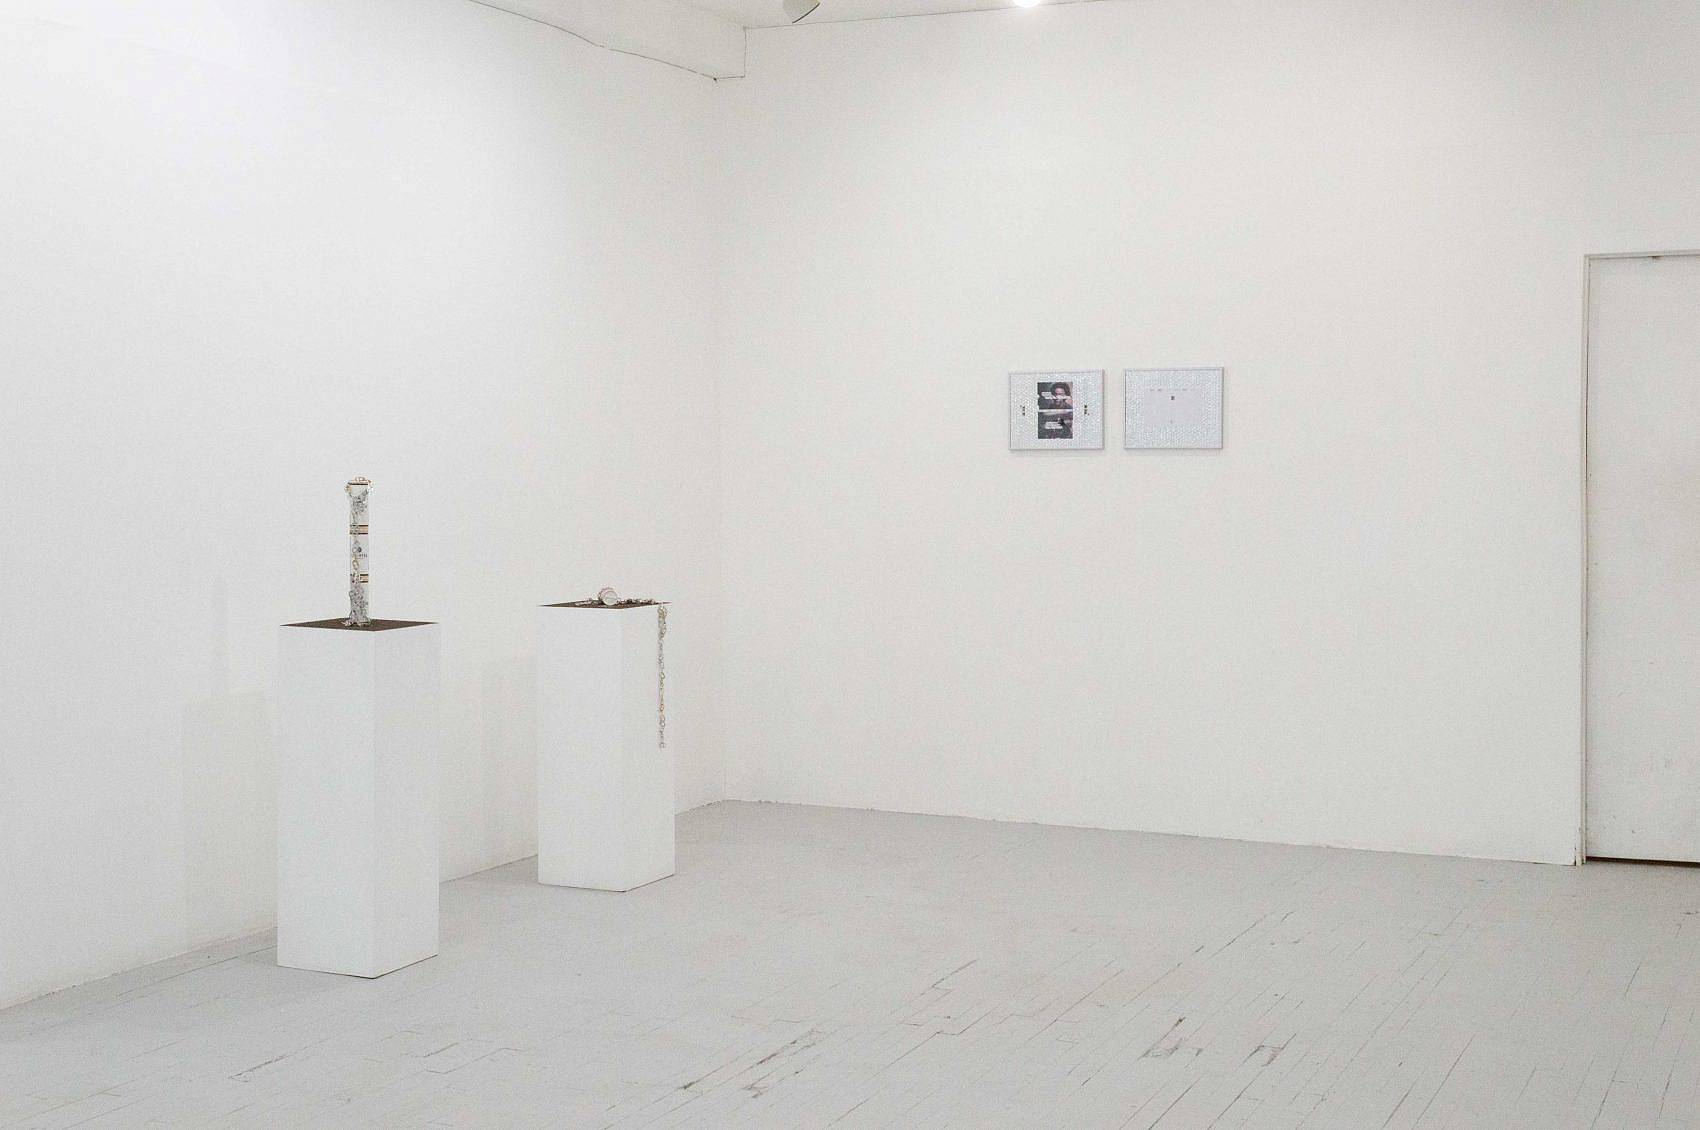 This is an installation shot of Zack Ingram's piece